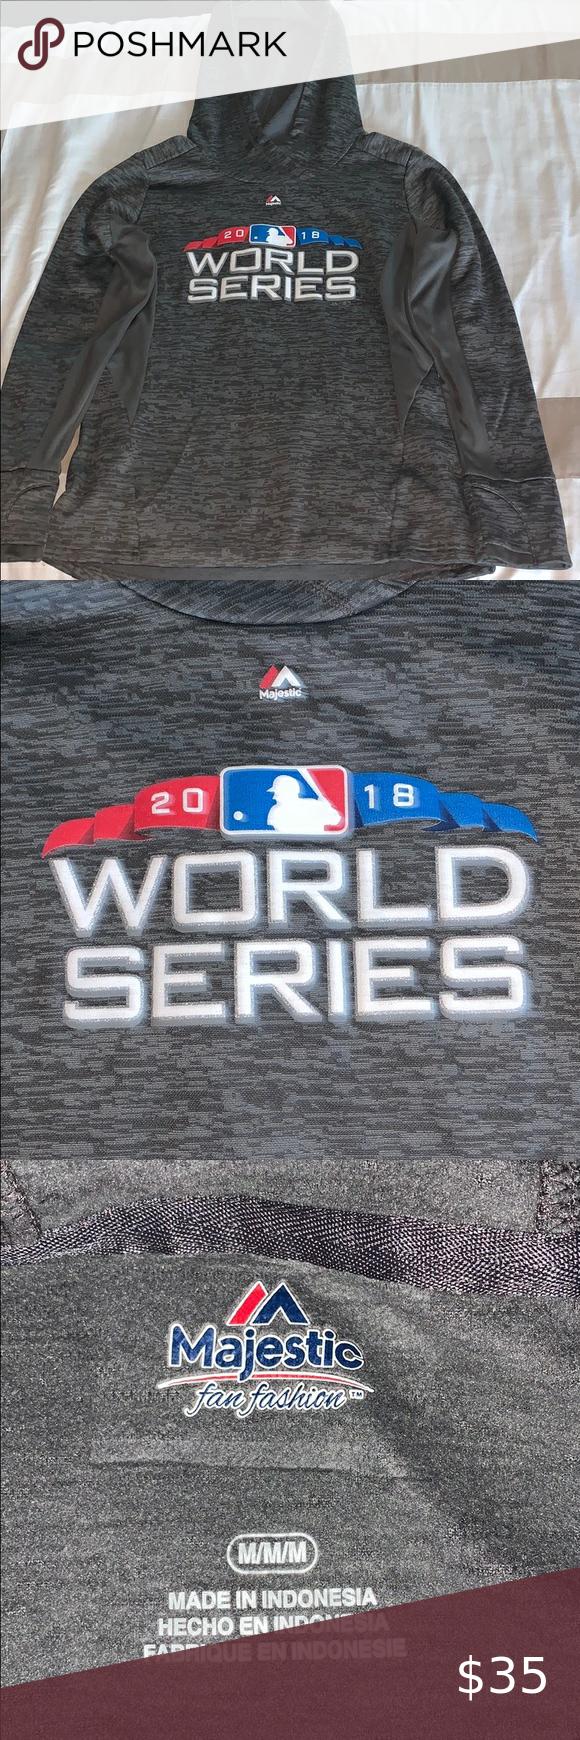 2018 World Series Sweatshirt In 2020 Majestic Shirts Sweatshirts Sweatshirt Shirt